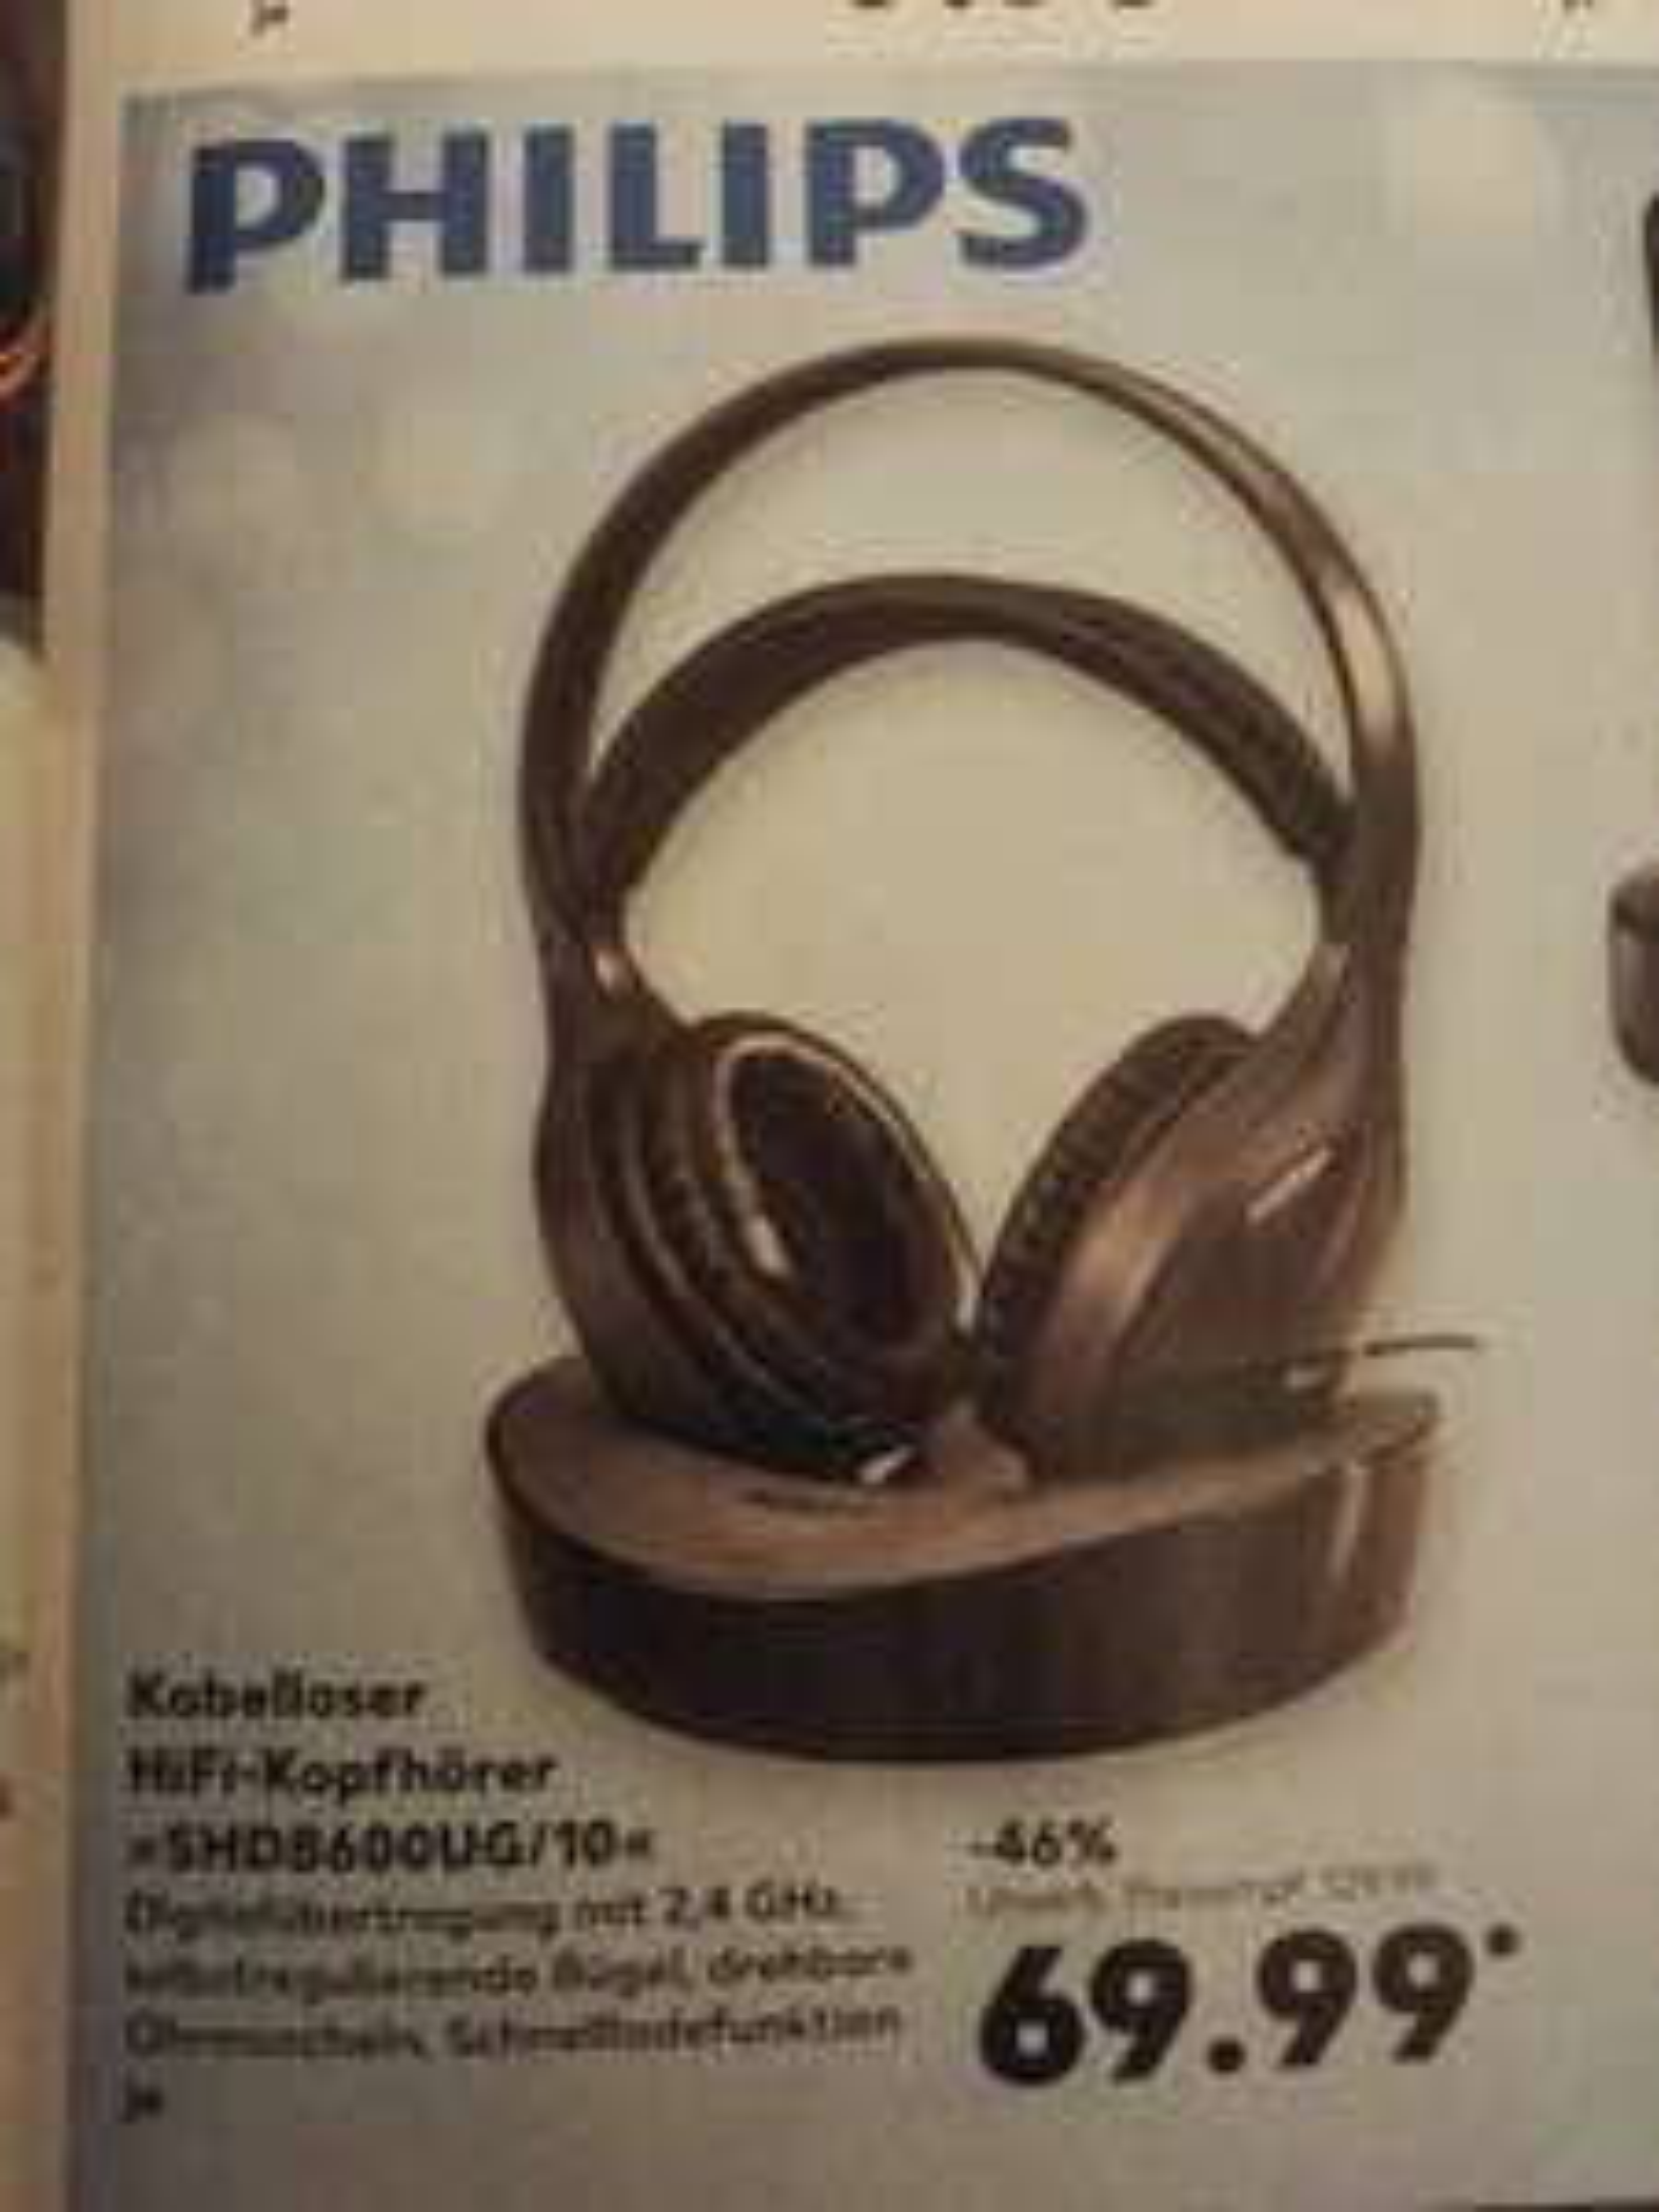 (@Kaufland, Lokal?) Philips SHD8600UG digitaler Funkkopfhörer, Idealo 91,40€